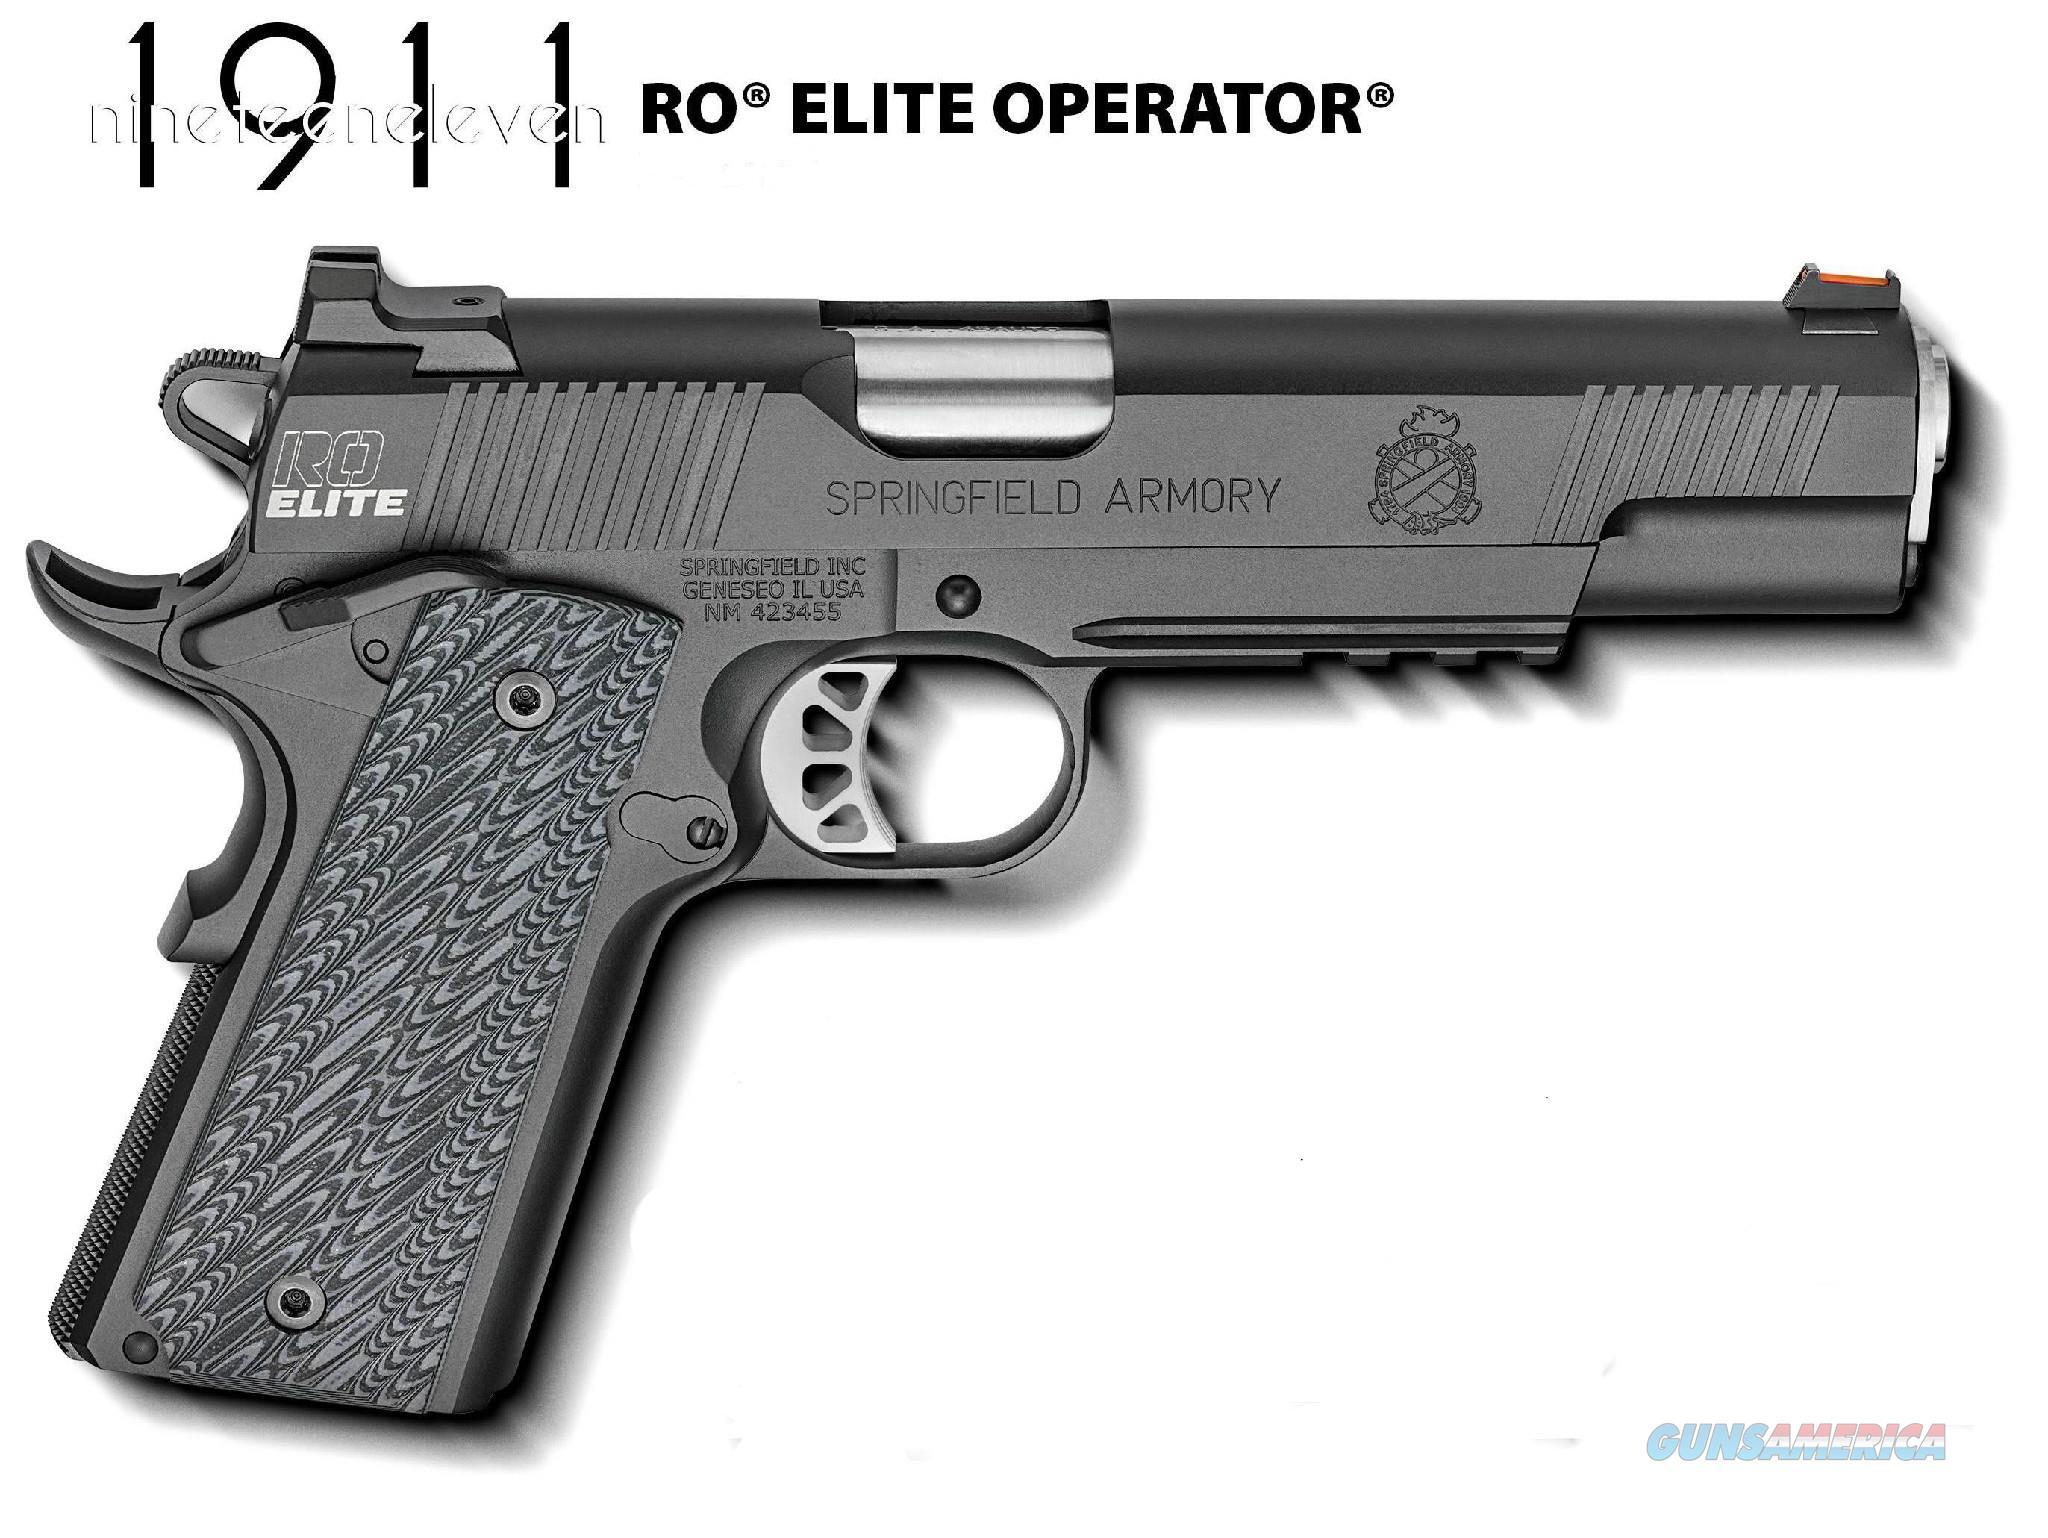 Springfield 1911 RO Elite Operator 9mm  w. Range Bag PI9130E *NEW*  Guns > Pistols > Springfield Armory Pistols > 1911 Type